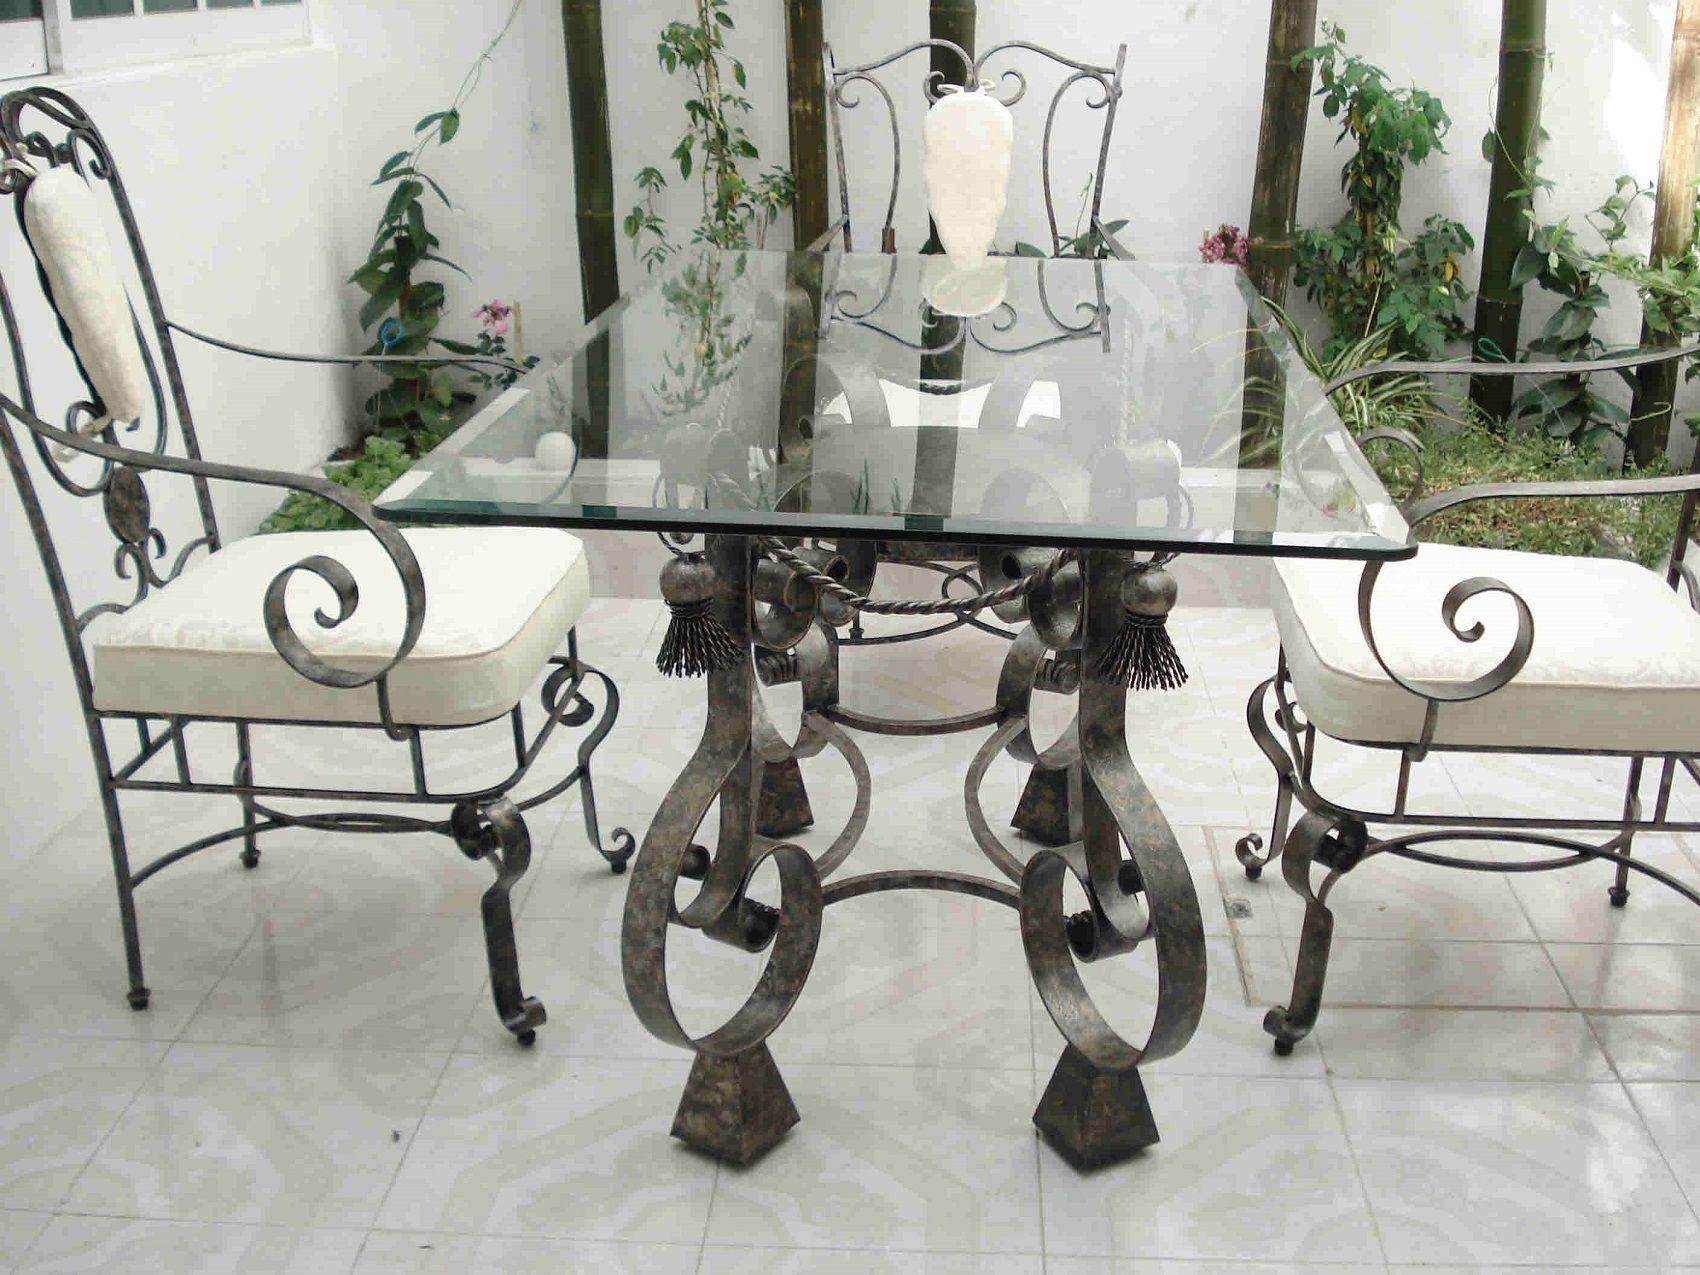 Mexican Patio Furniture For Garden And Veranda Wrought Iron Garden Furniture Wrought Iron Dining Table Metal Patio Furniture